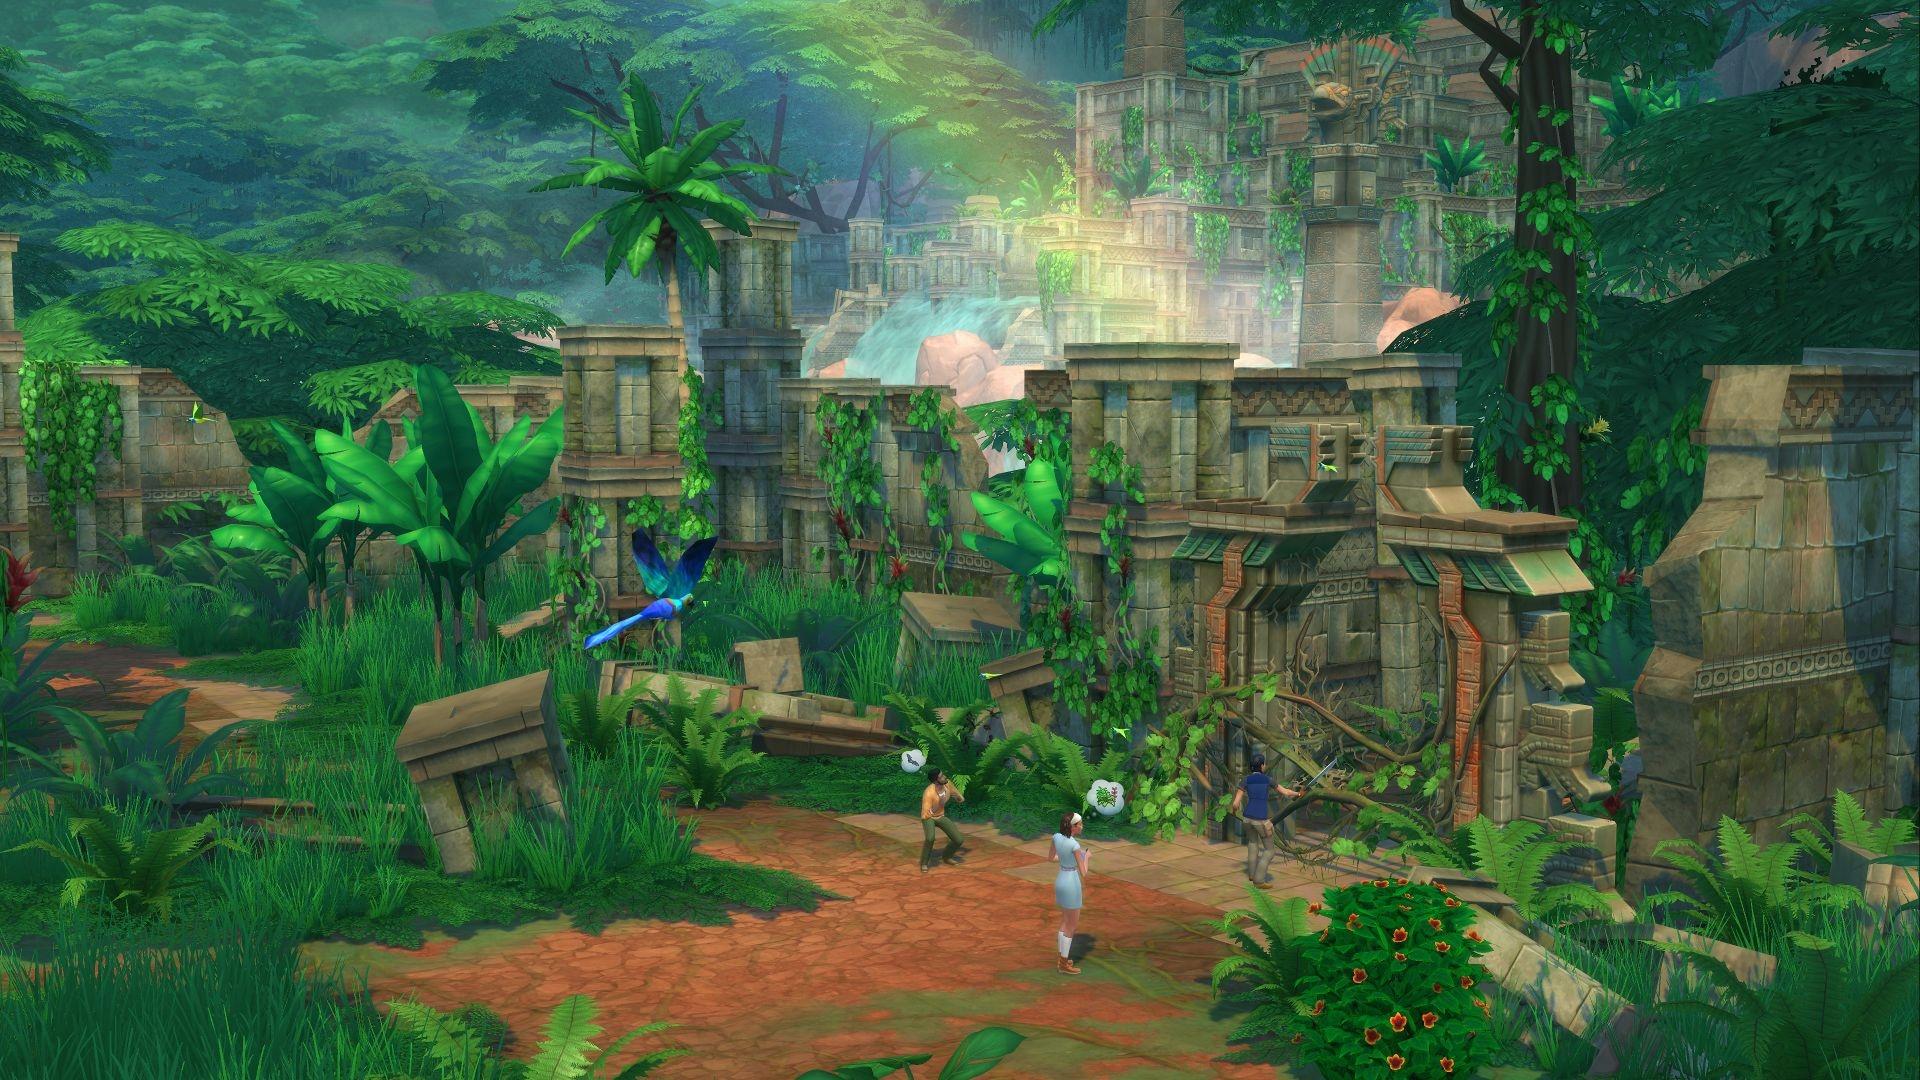 The Sims 4 Jungle Adventure Origin Key GLOBAL - 4